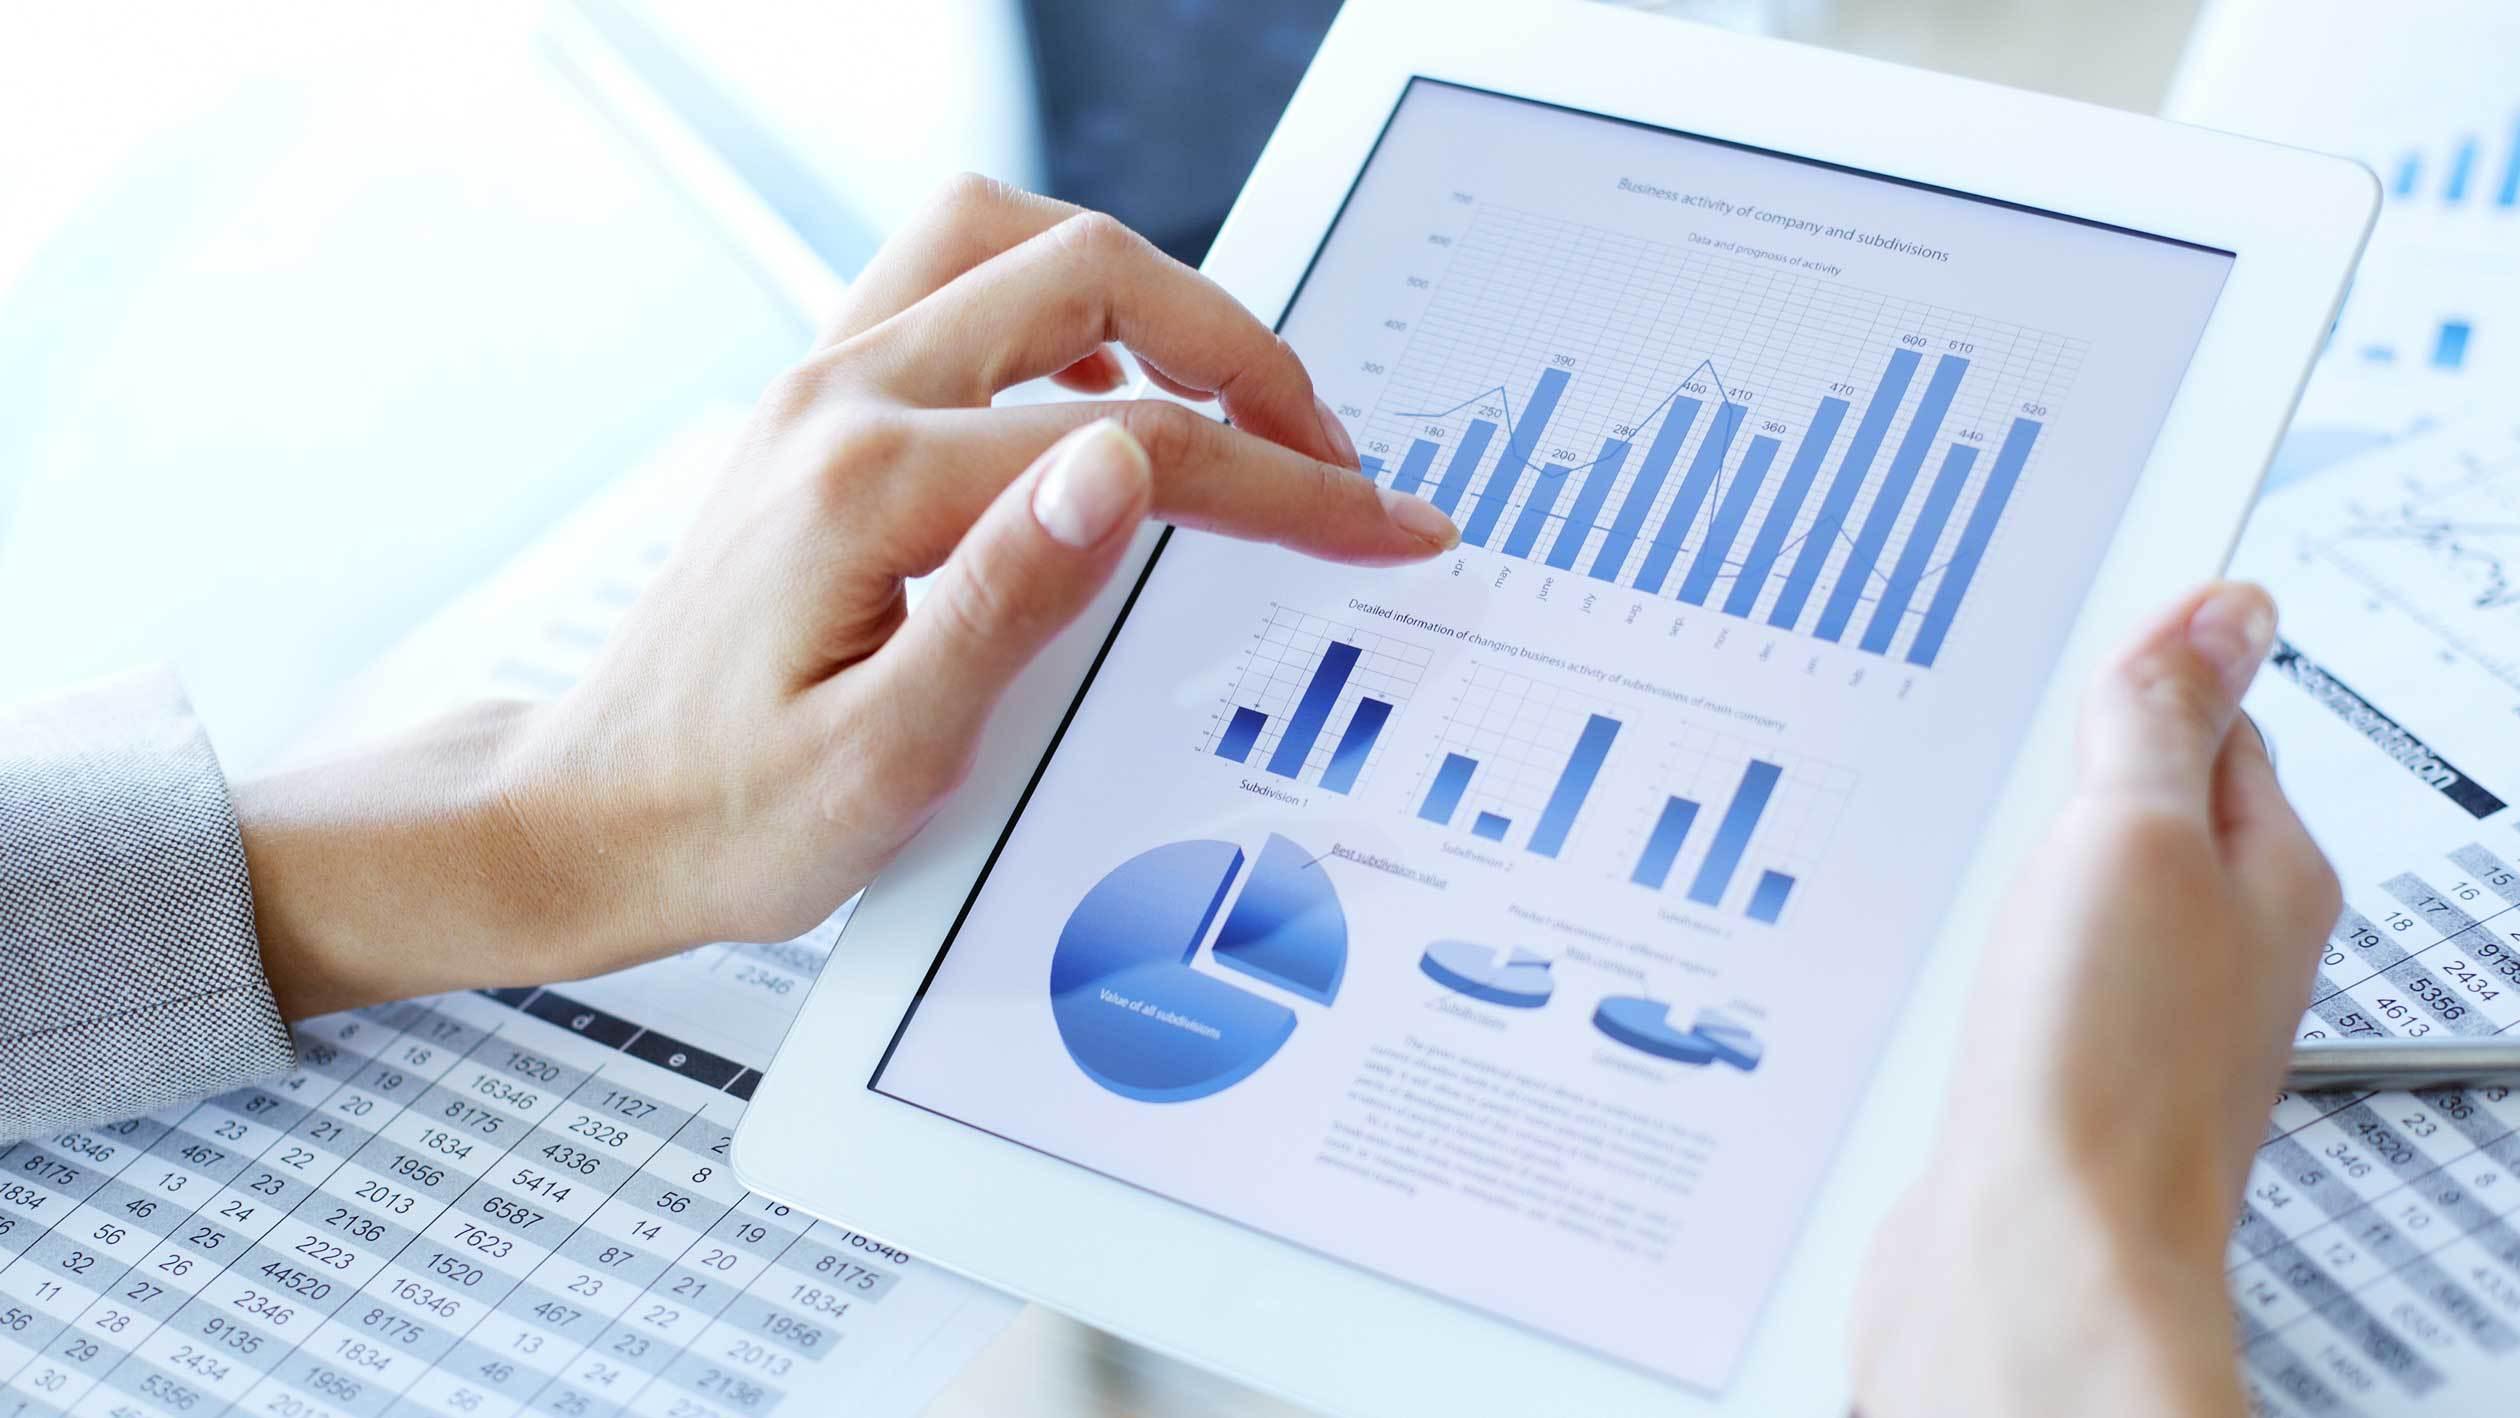 Fundos de Investimento - London Capital - Tablet - Gráficos